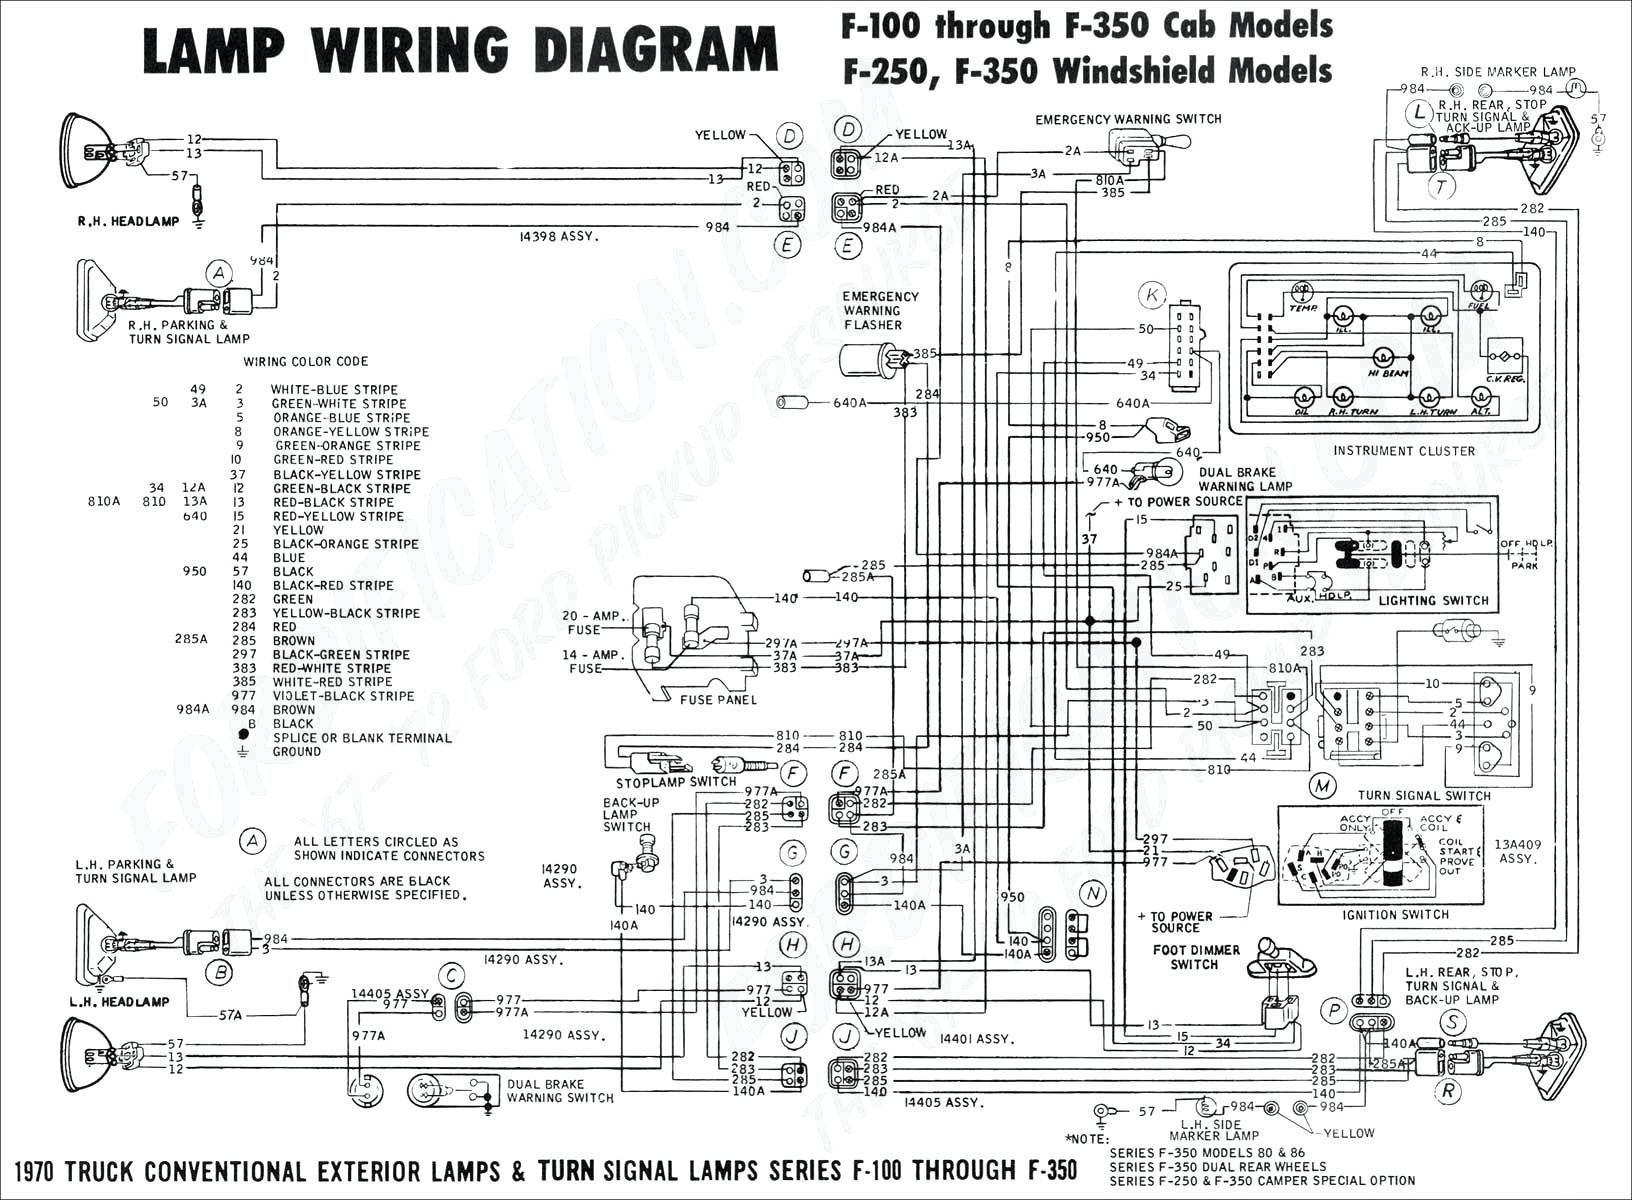 2005 Hyundai Tucson Engine Diagram Wire Diagram 04 Hyundai Santa Fe Ets Wiring Diagram Used Of 2005 Hyundai Tucson Engine Diagram